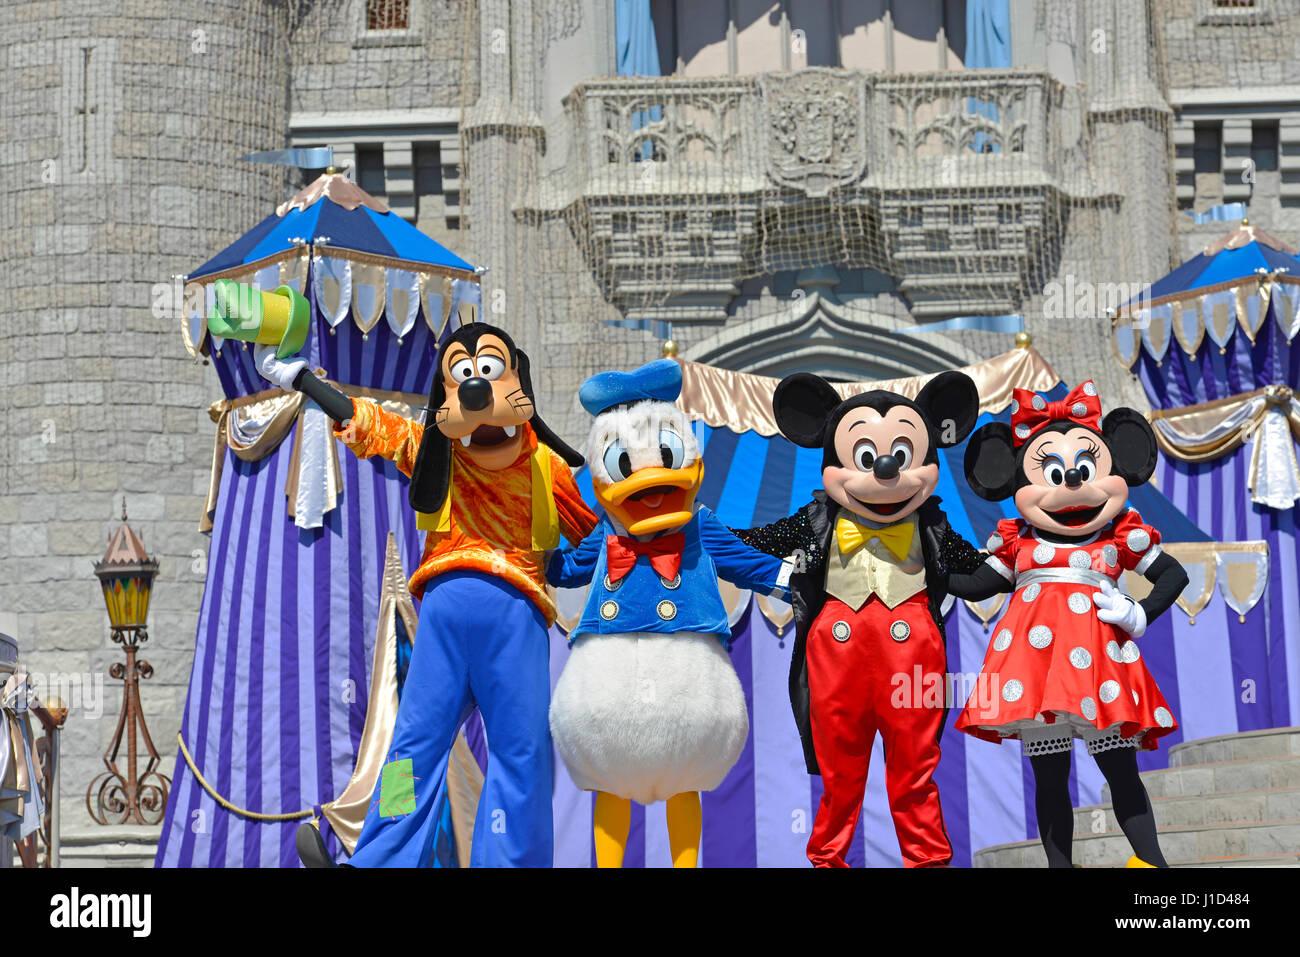 Disney Characters, Mickey Minnie Goofy Donald Duck, Cinderella Castle at Magic Kingdom, Disney World Resort, Orlando - Stock Image